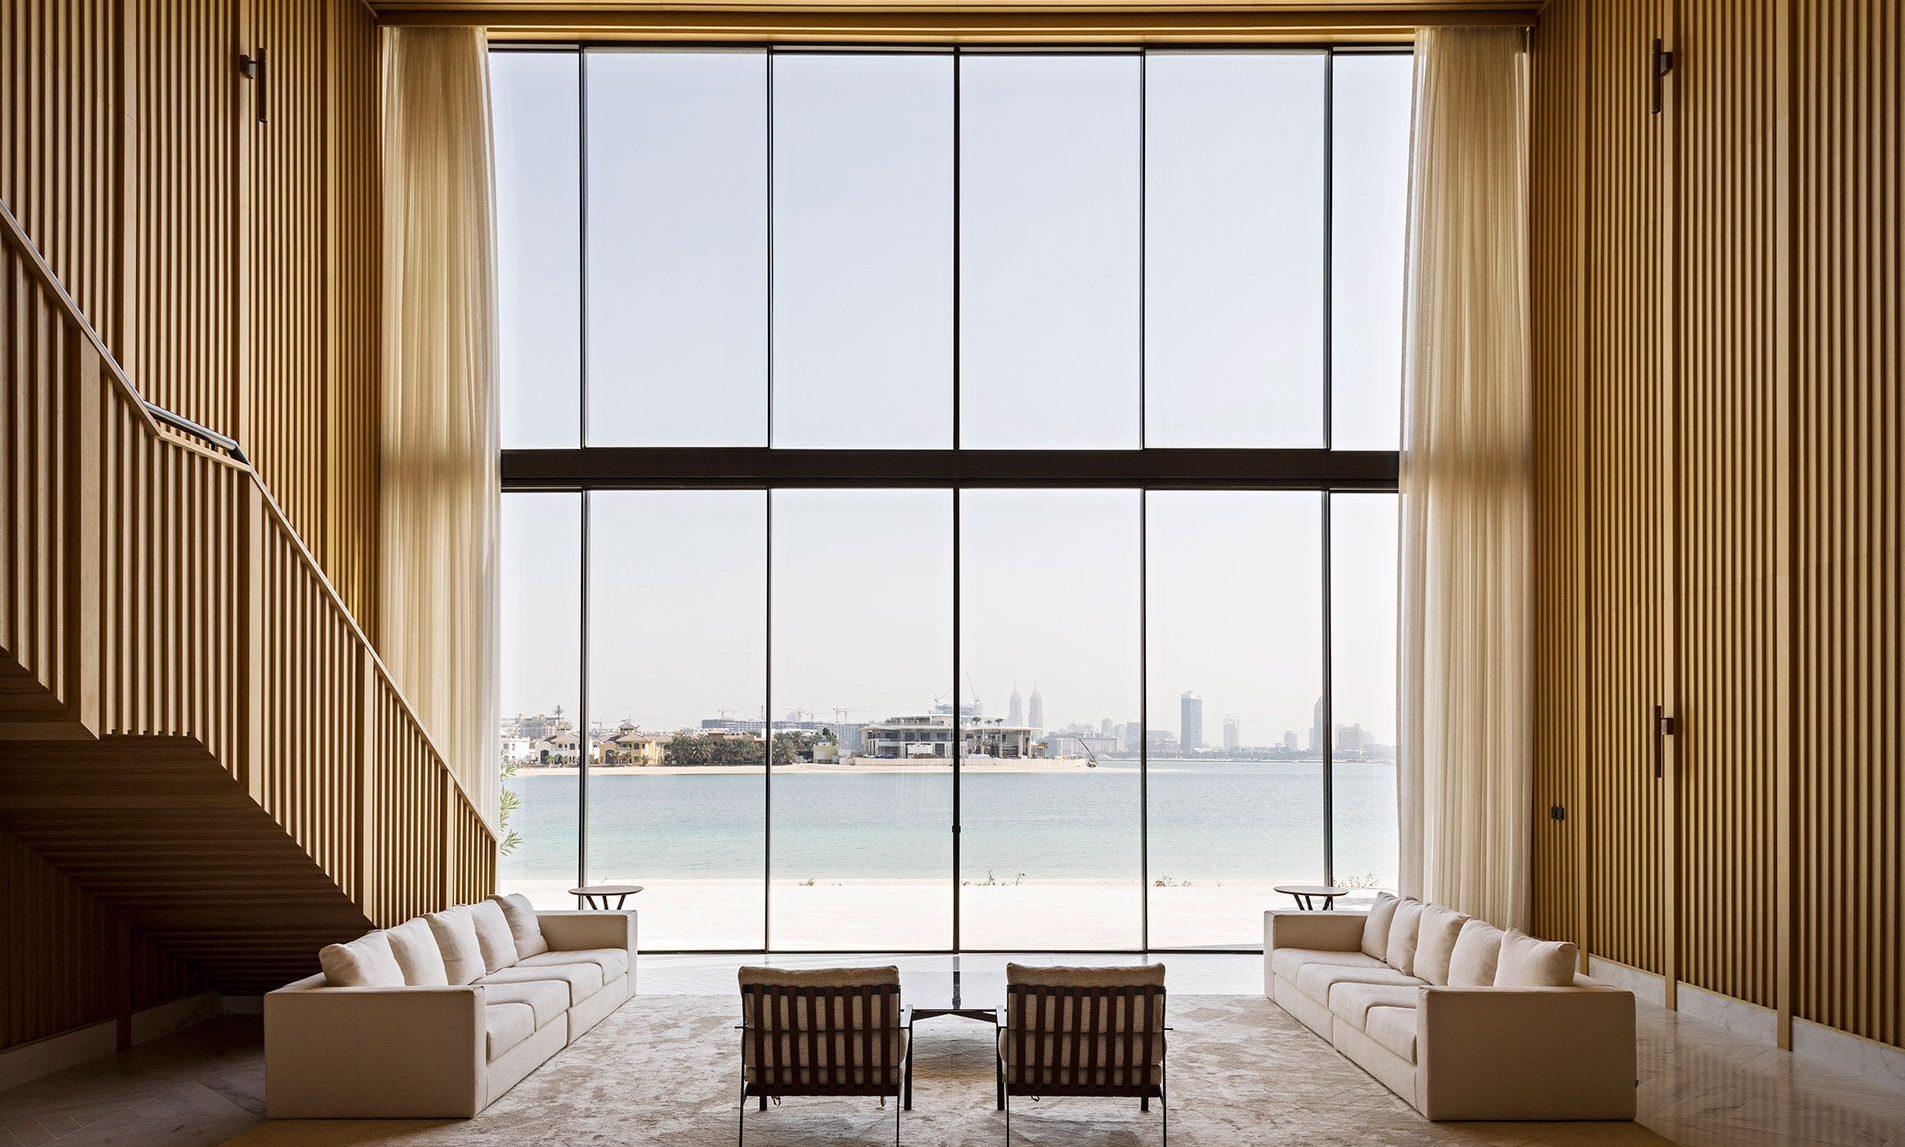 01-DUB5-AMAR-SABEH-Architecture-Studio-Palm-villa-Dubai-2018-©Yann-Deret-7910-e1559918602356.jpg